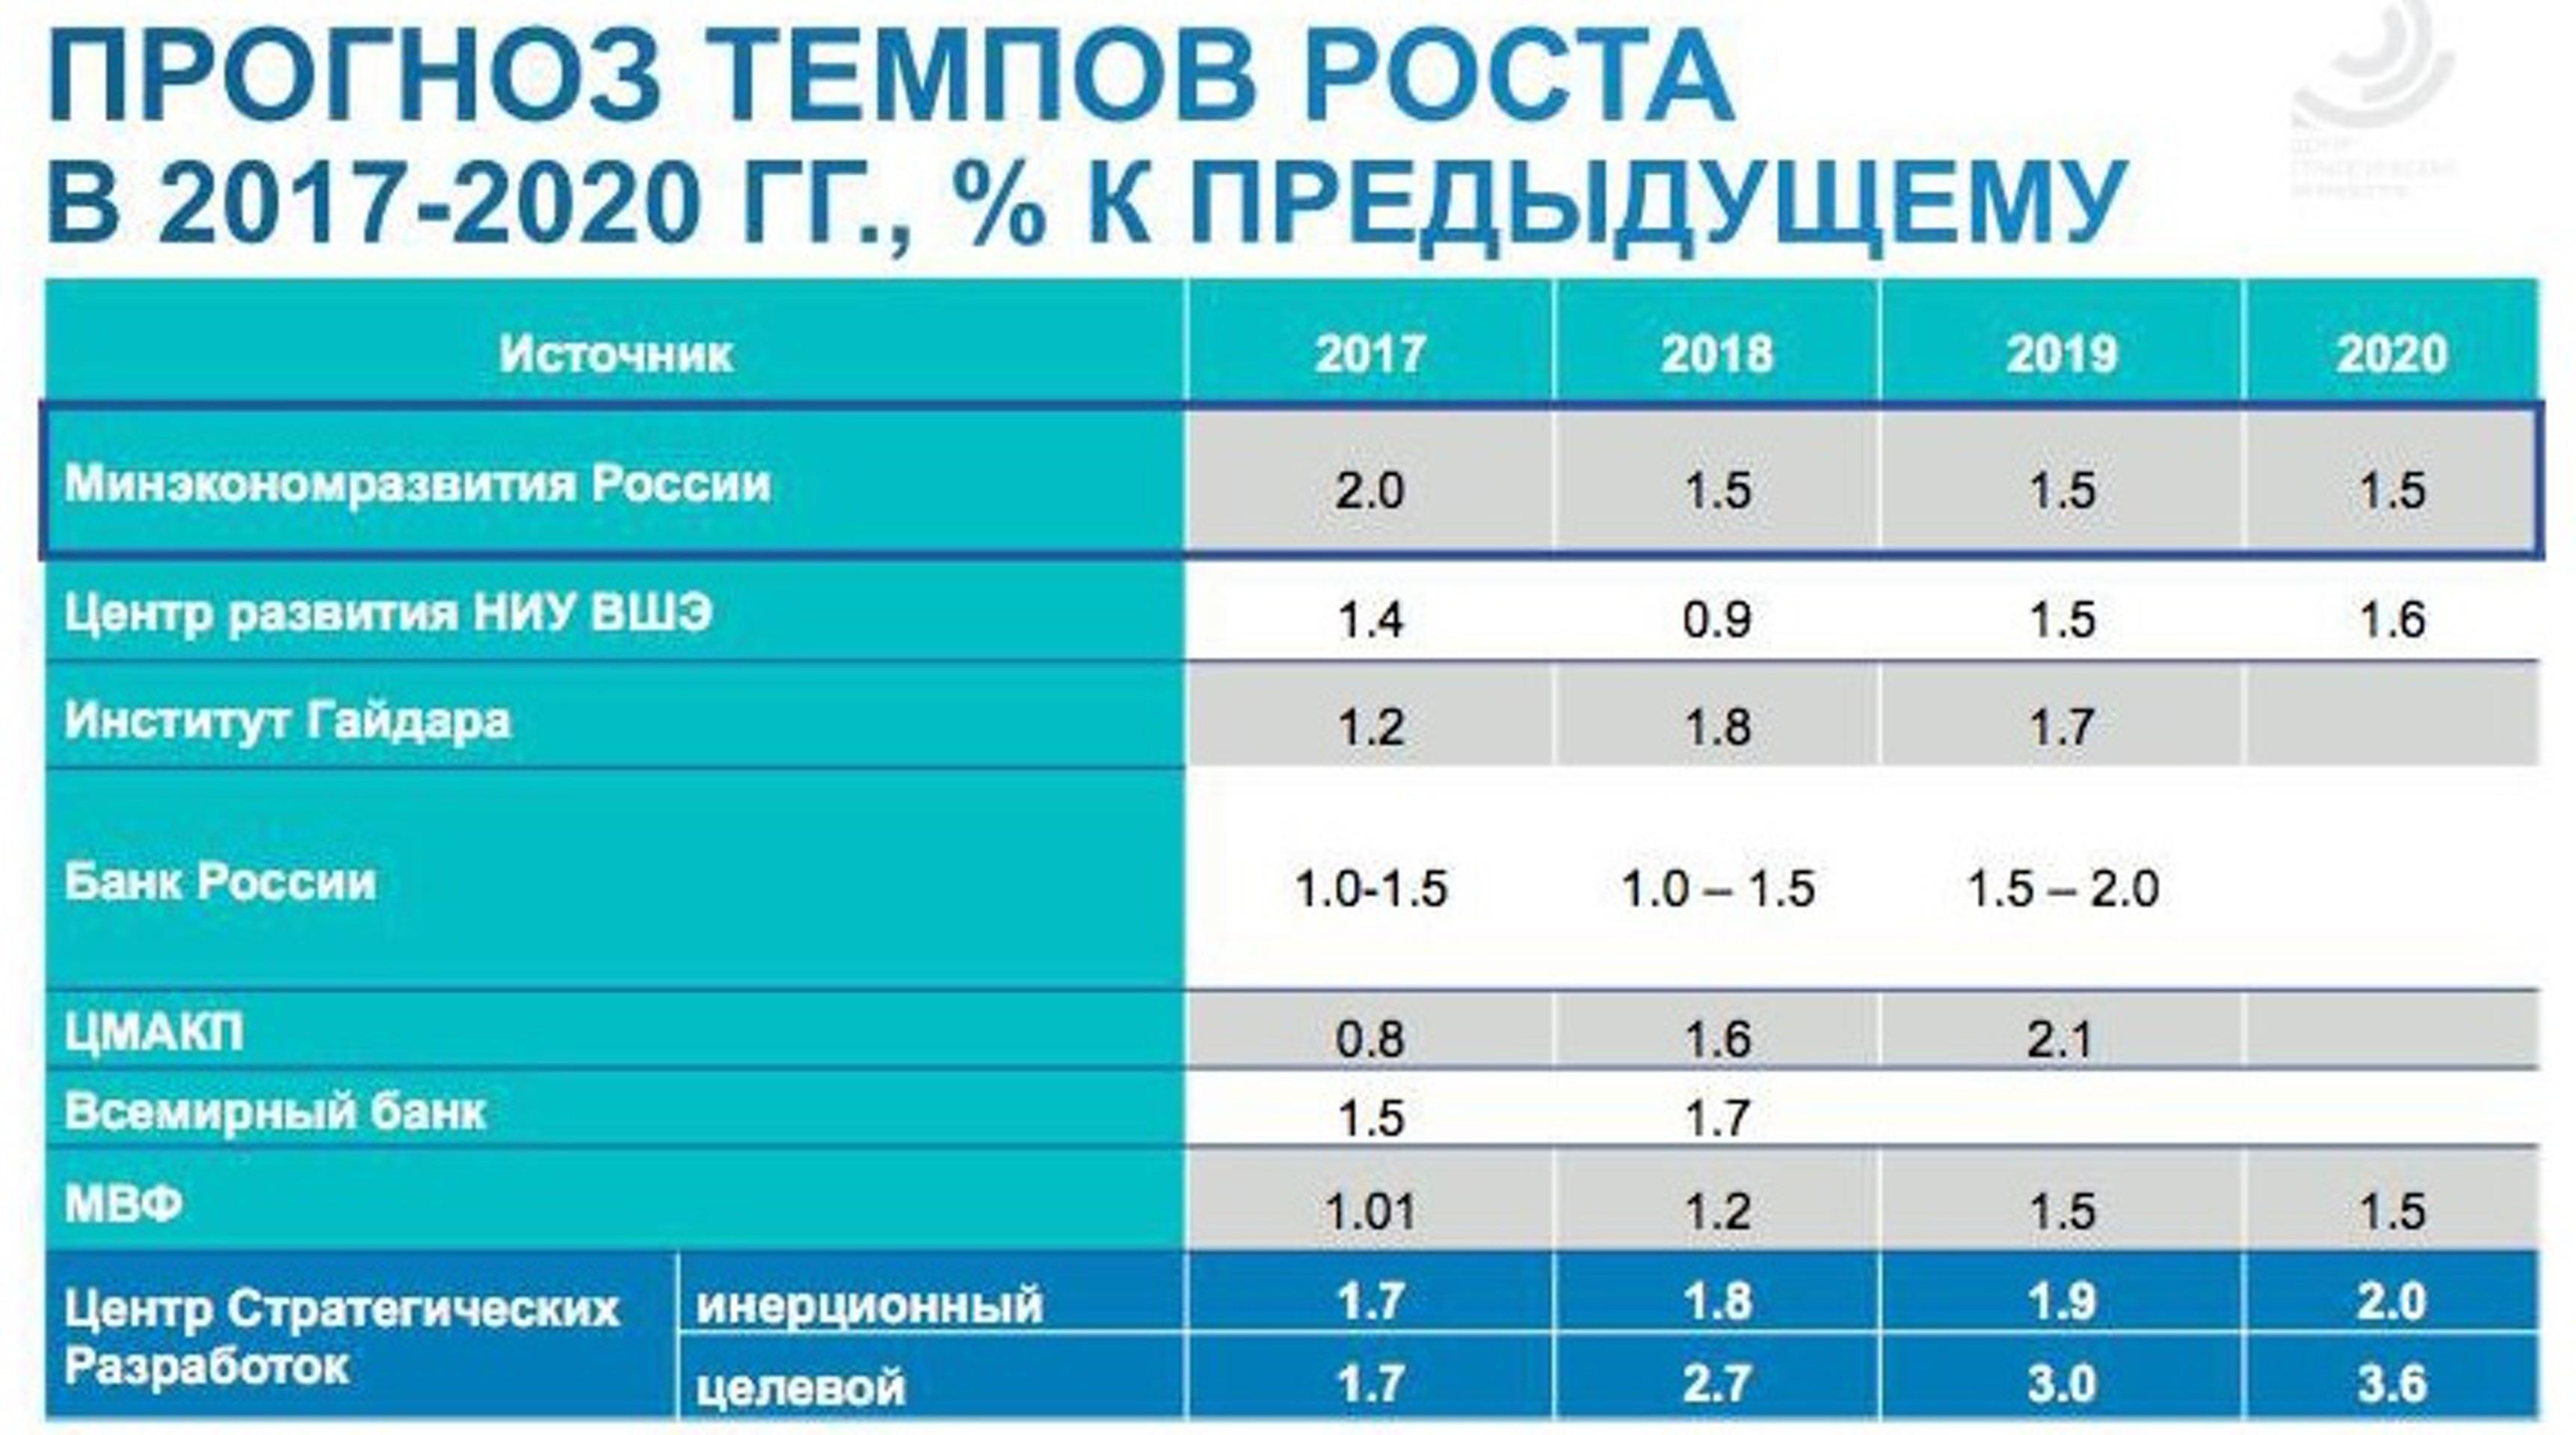 Кудрин и Силуанов поспорили о зависимости от нефти